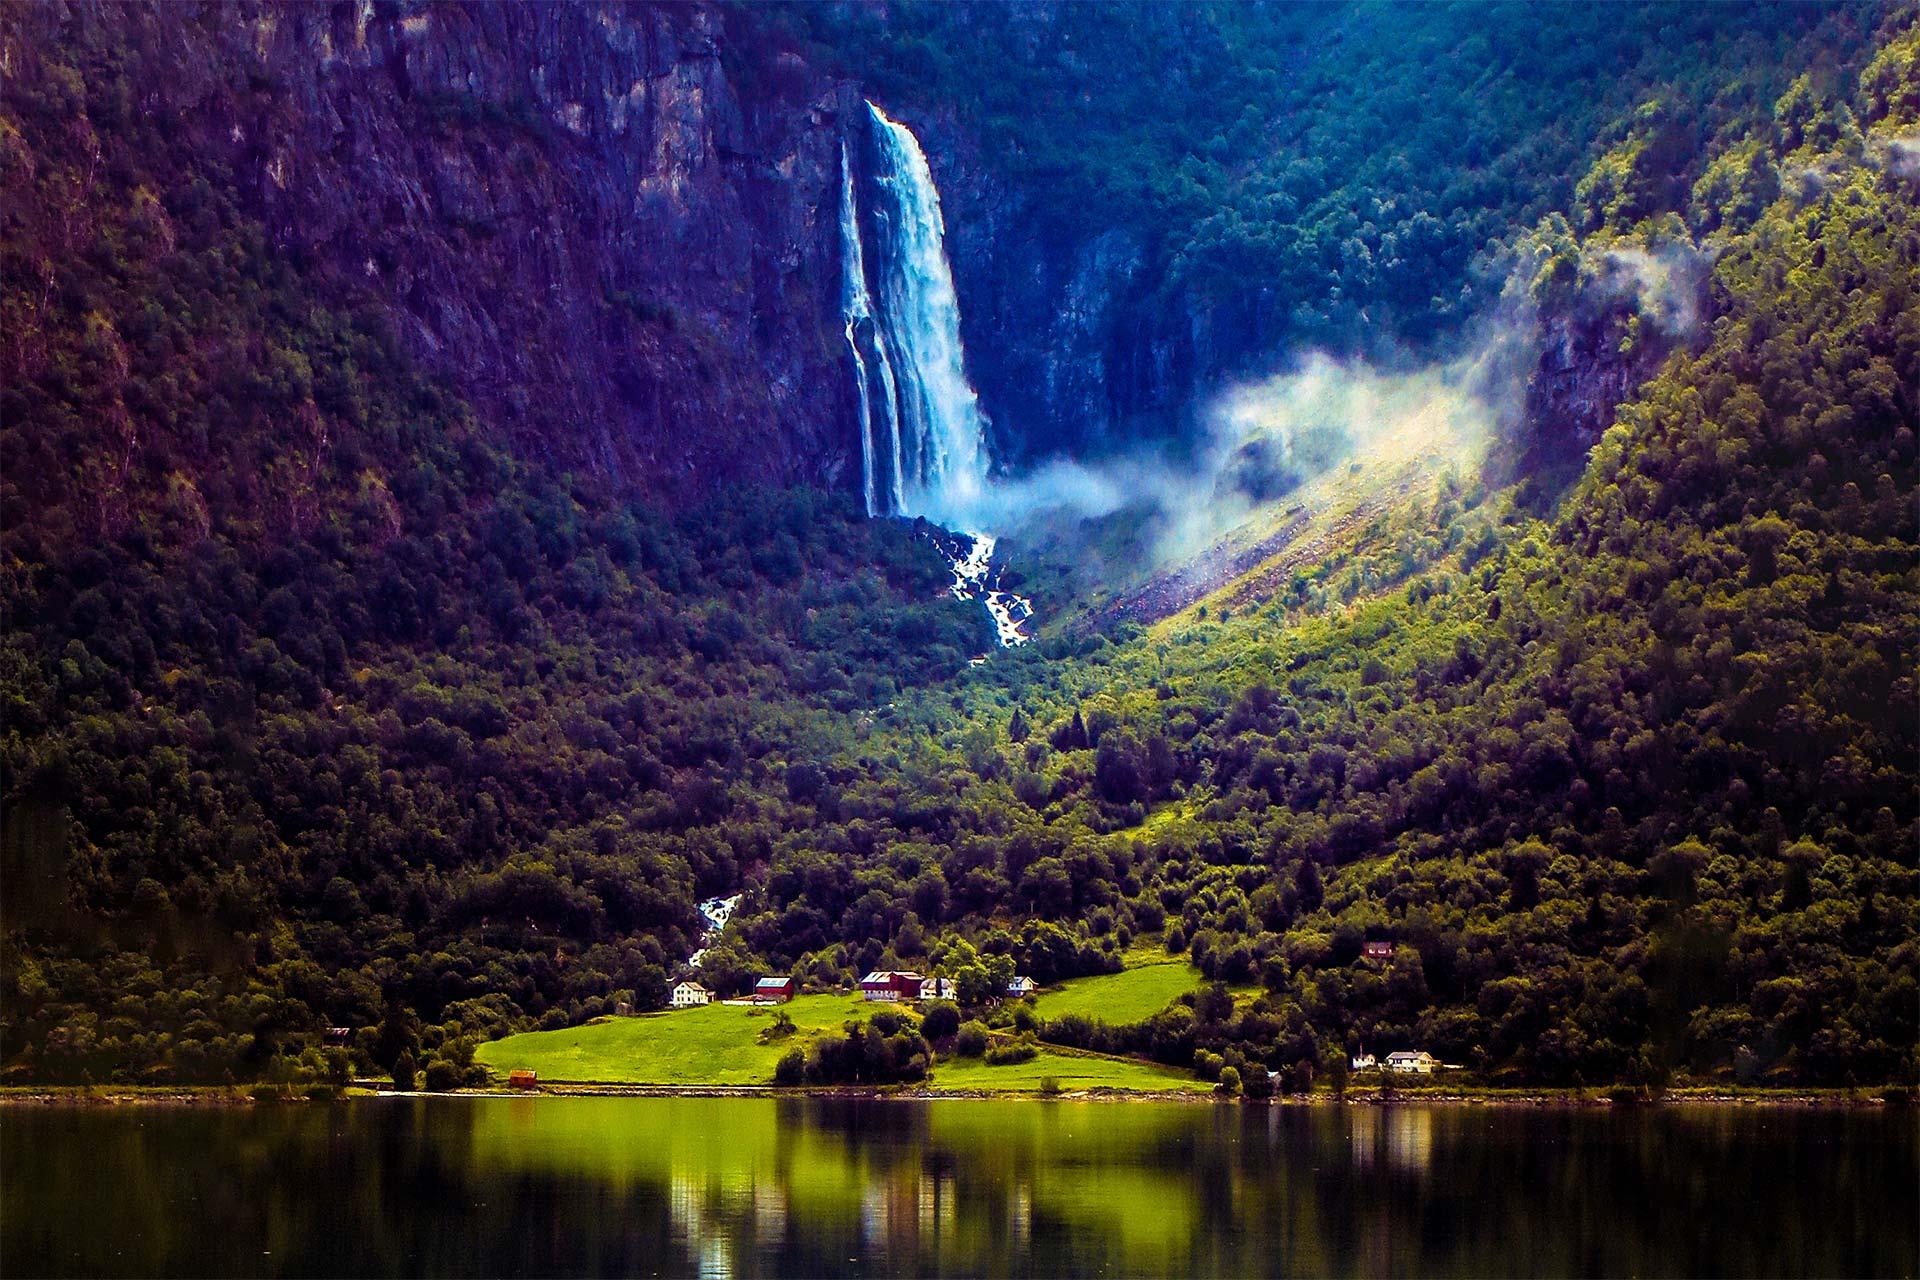 Skandinavien - Landschaftsfotografie- Blogbeitrag - Fotoreise durch Skandinavien